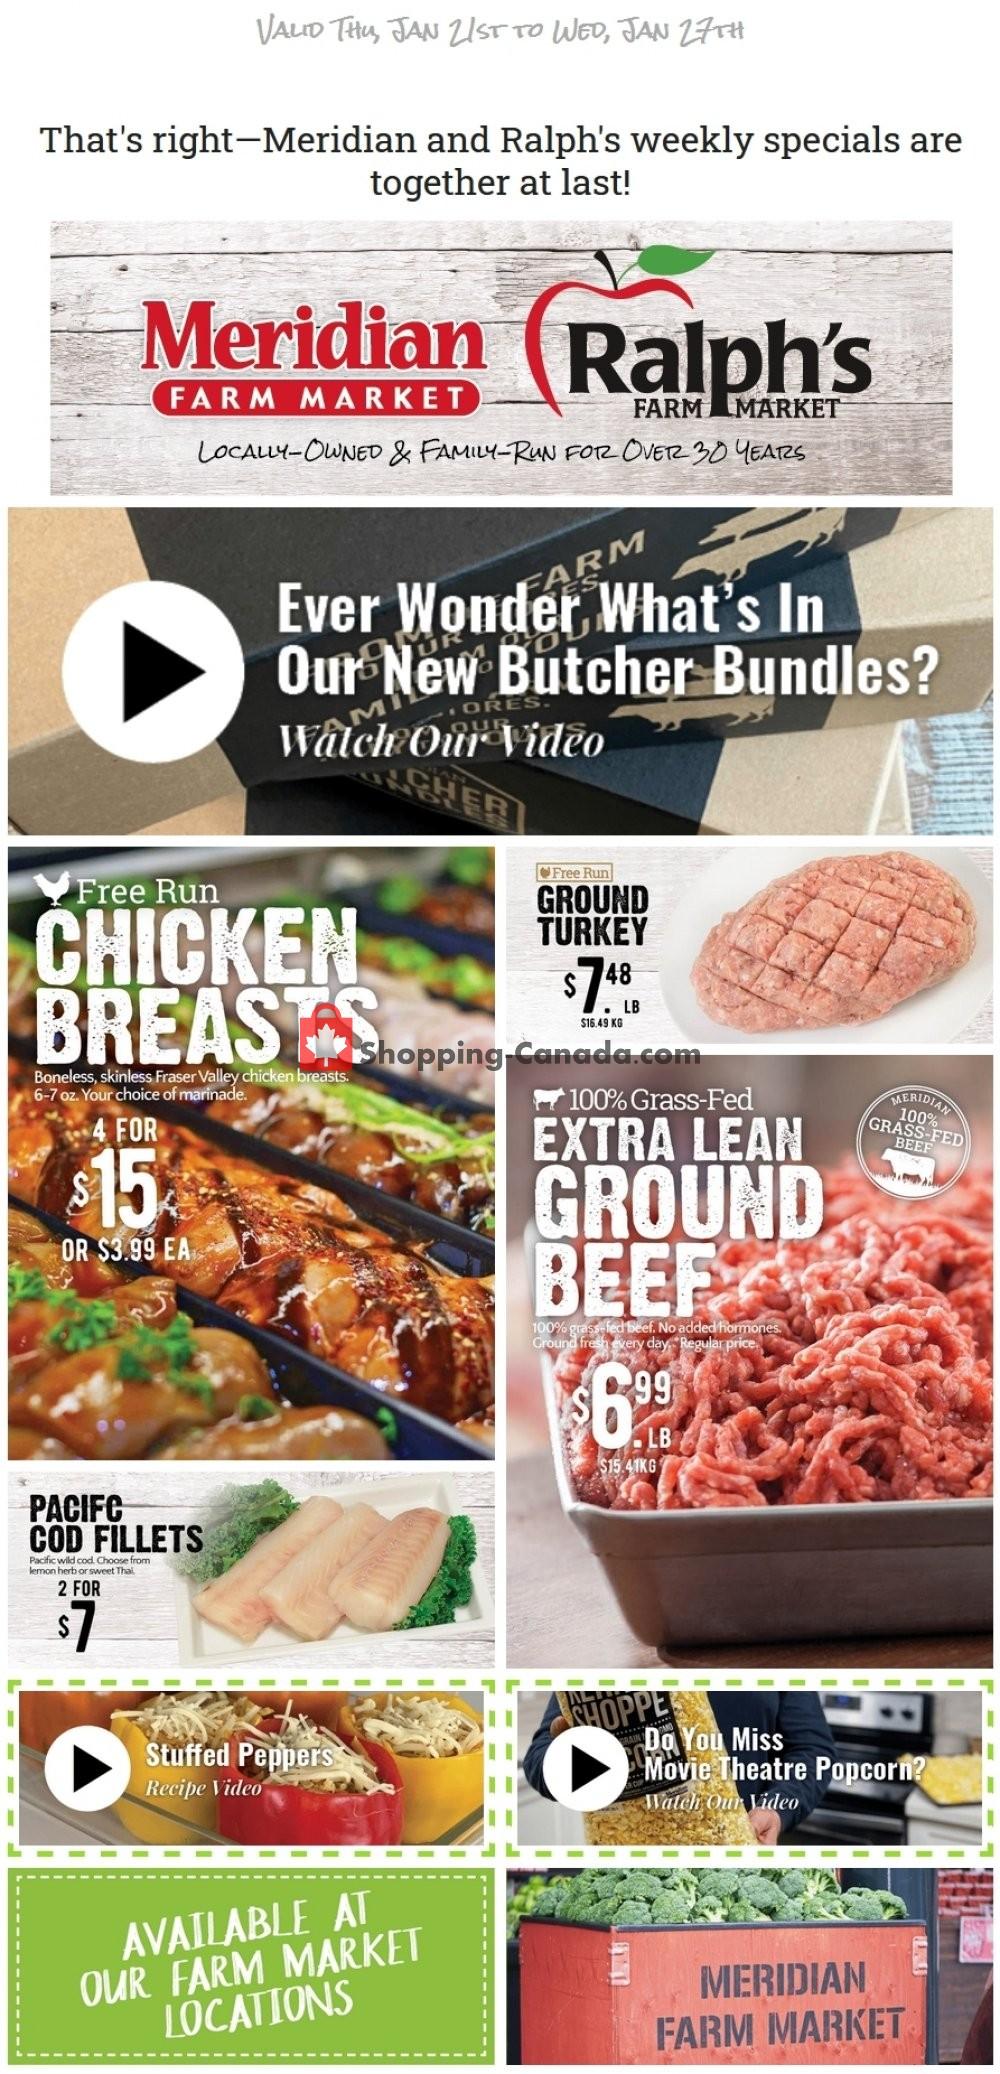 Flyer Meridian Meats & Meridian Farm Market Canada - from Thursday January 21, 2021 to Wednesday January 27, 2021